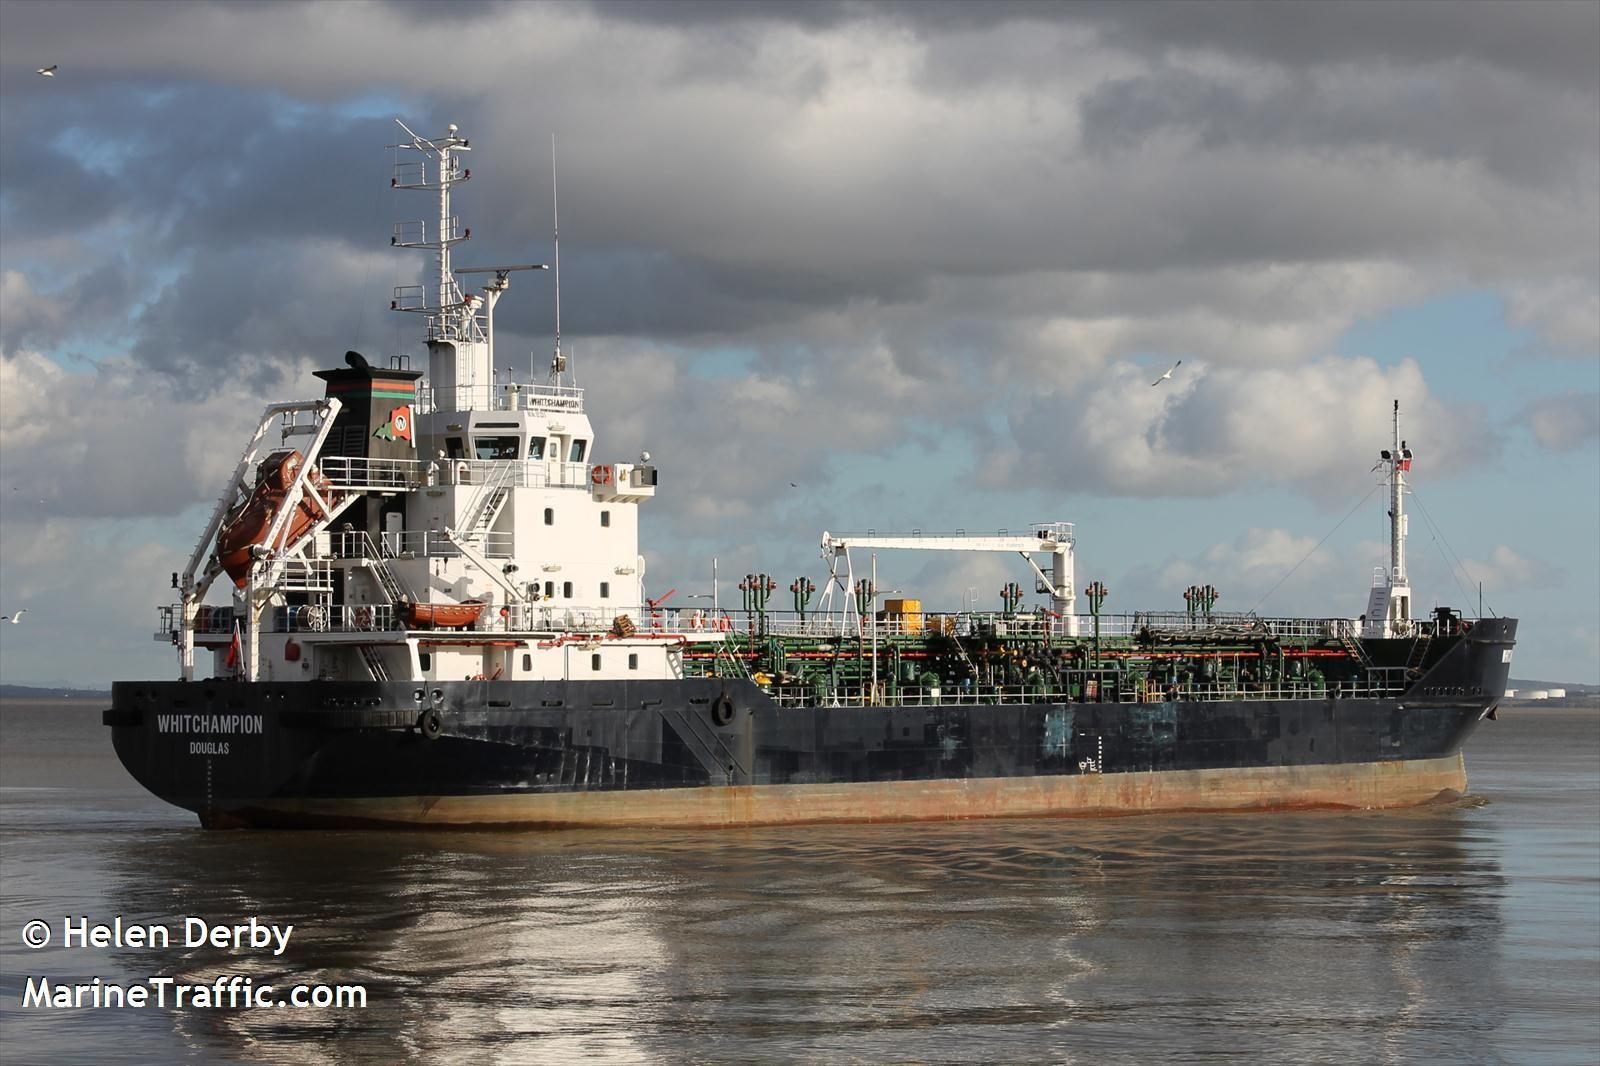 Whitchampion/Tanker/85mx15m.